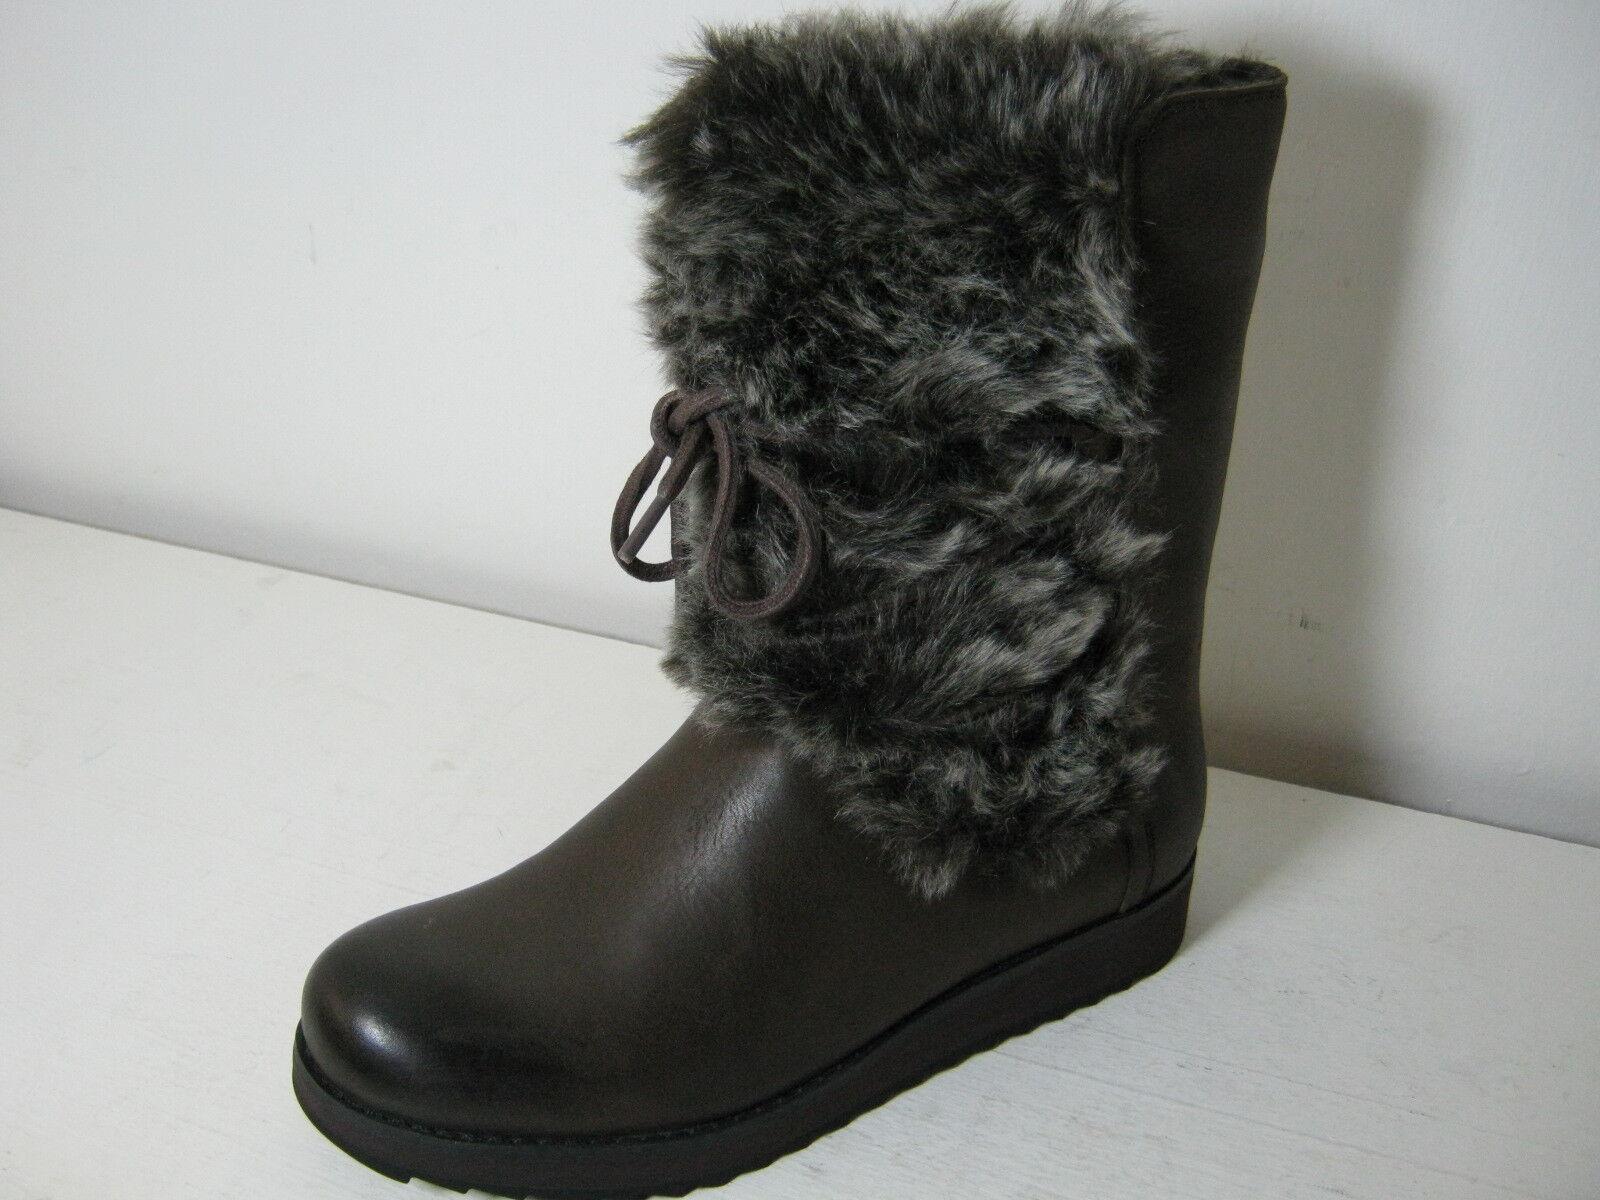 Ladies Clarks Minx Jeanie Dark Brown Leather & Faux Fur Cuff Mid Calf Boots